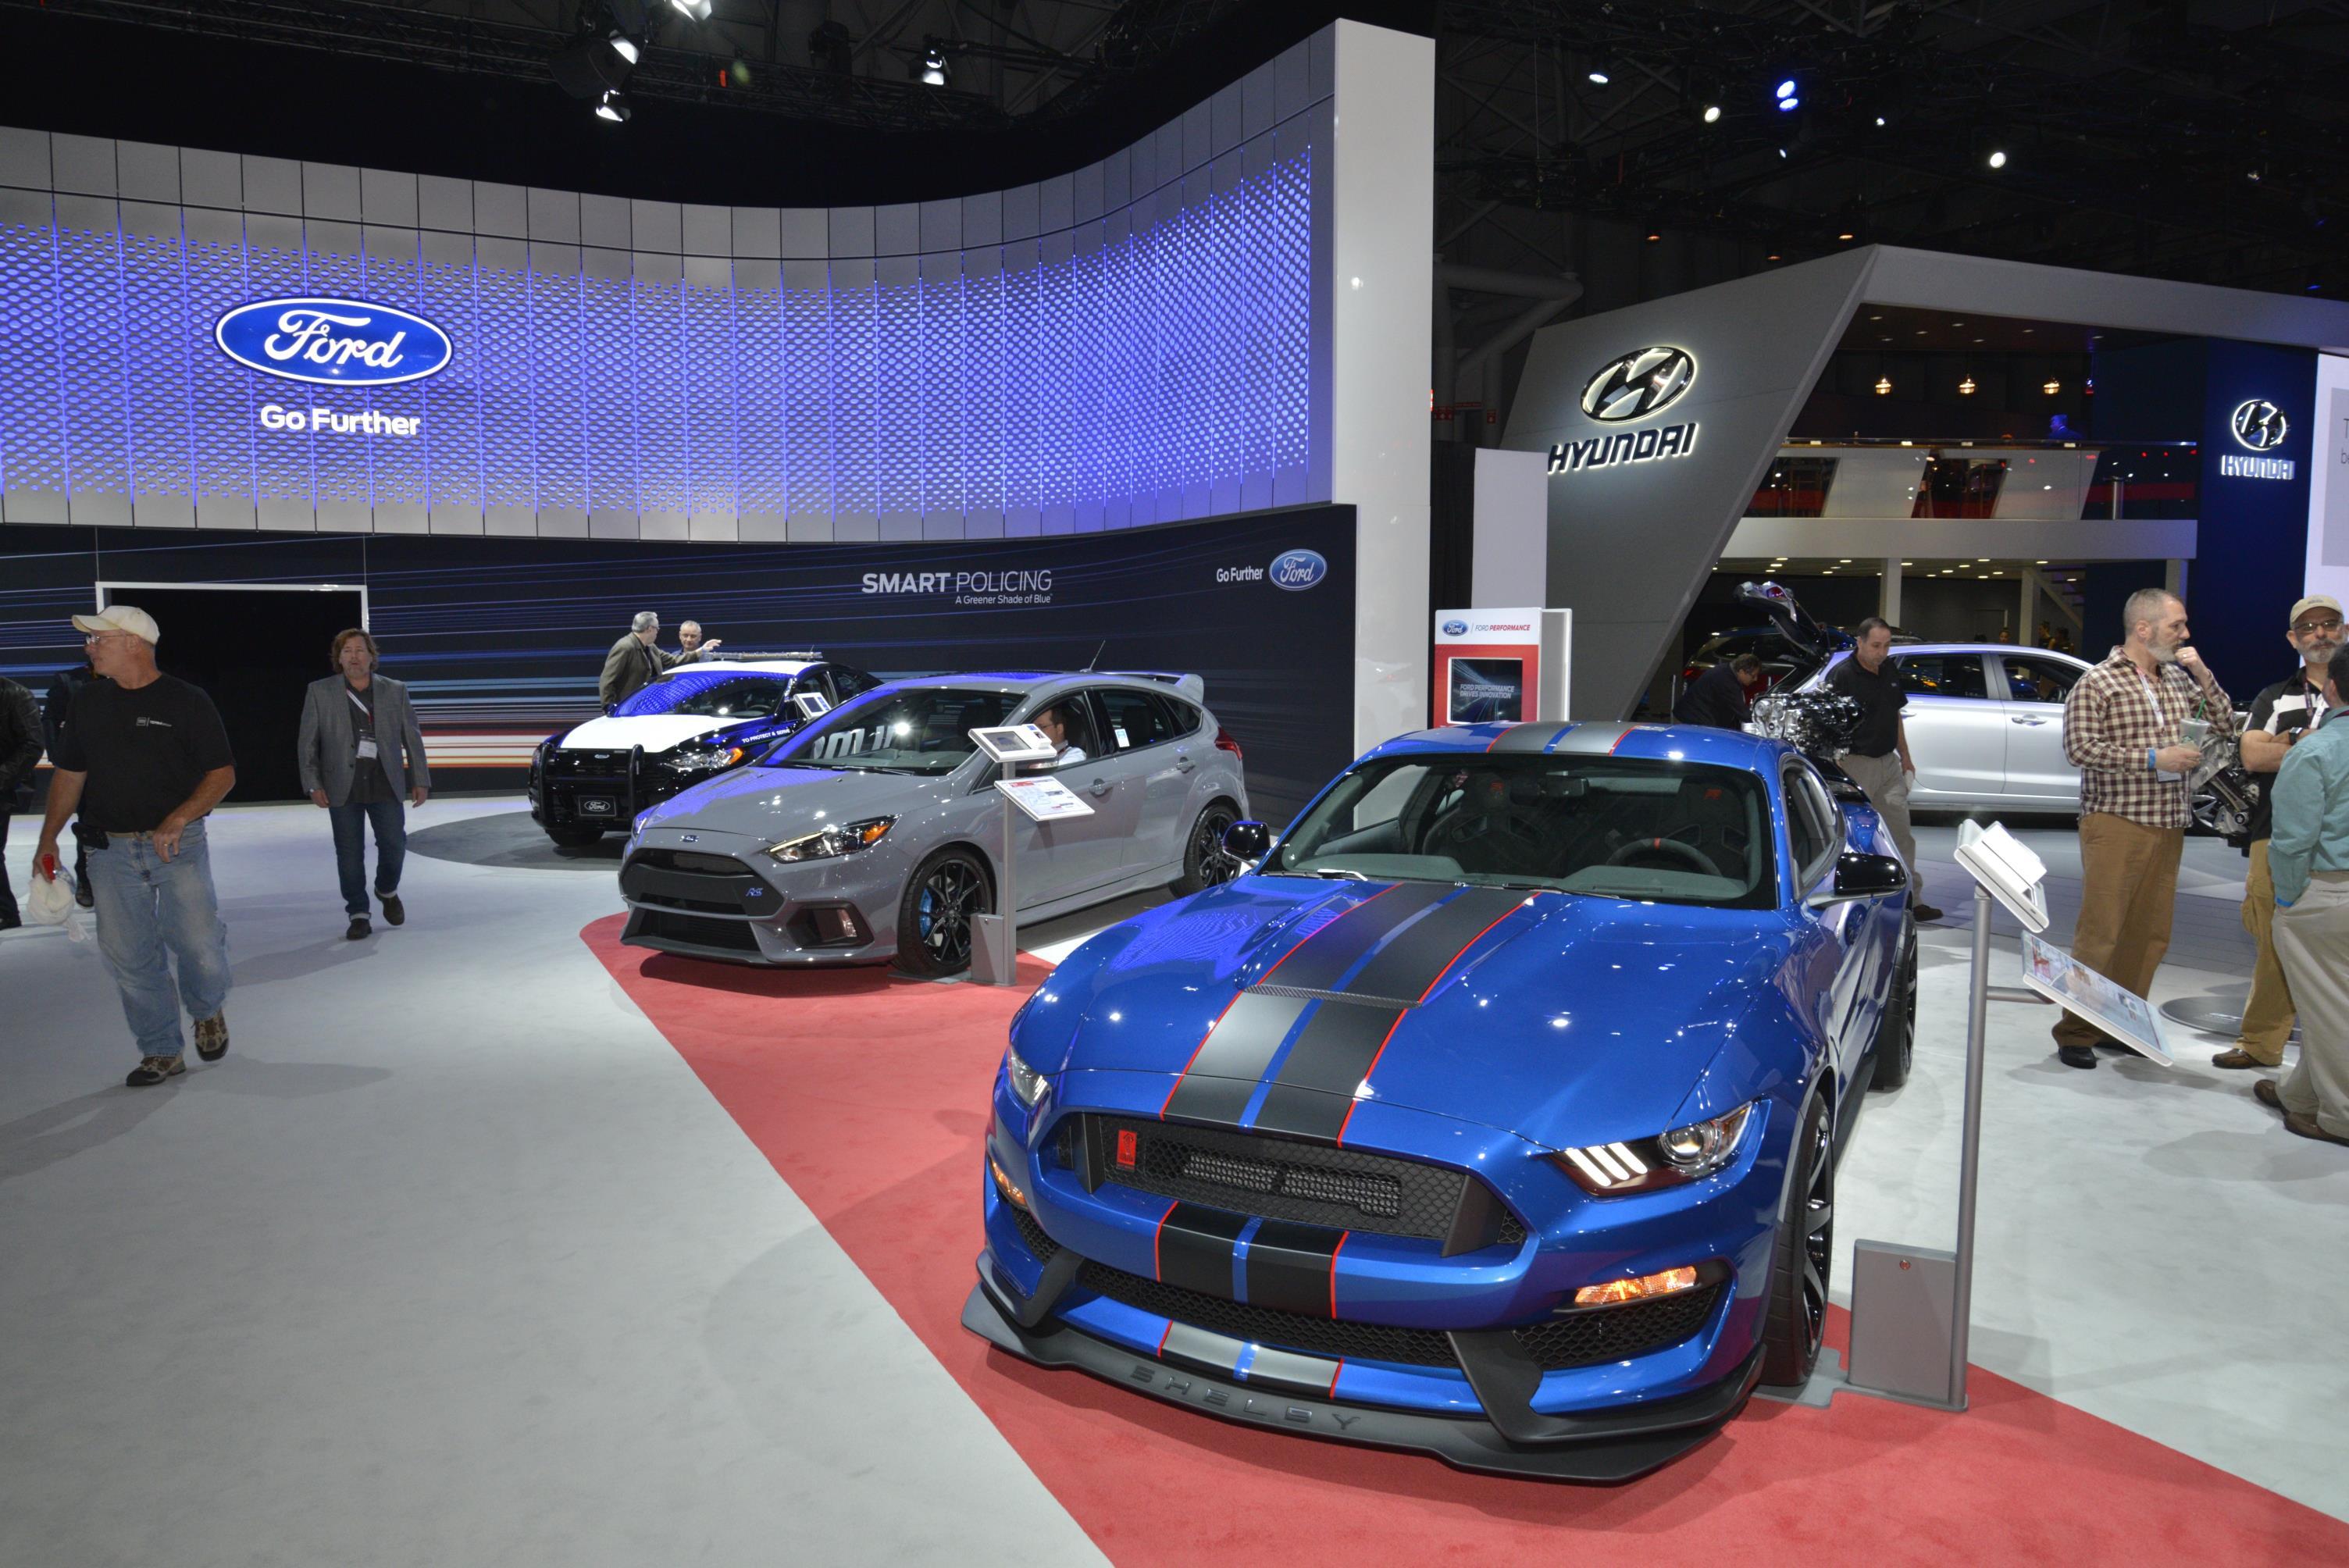 New York Auto Show 2017 (11)